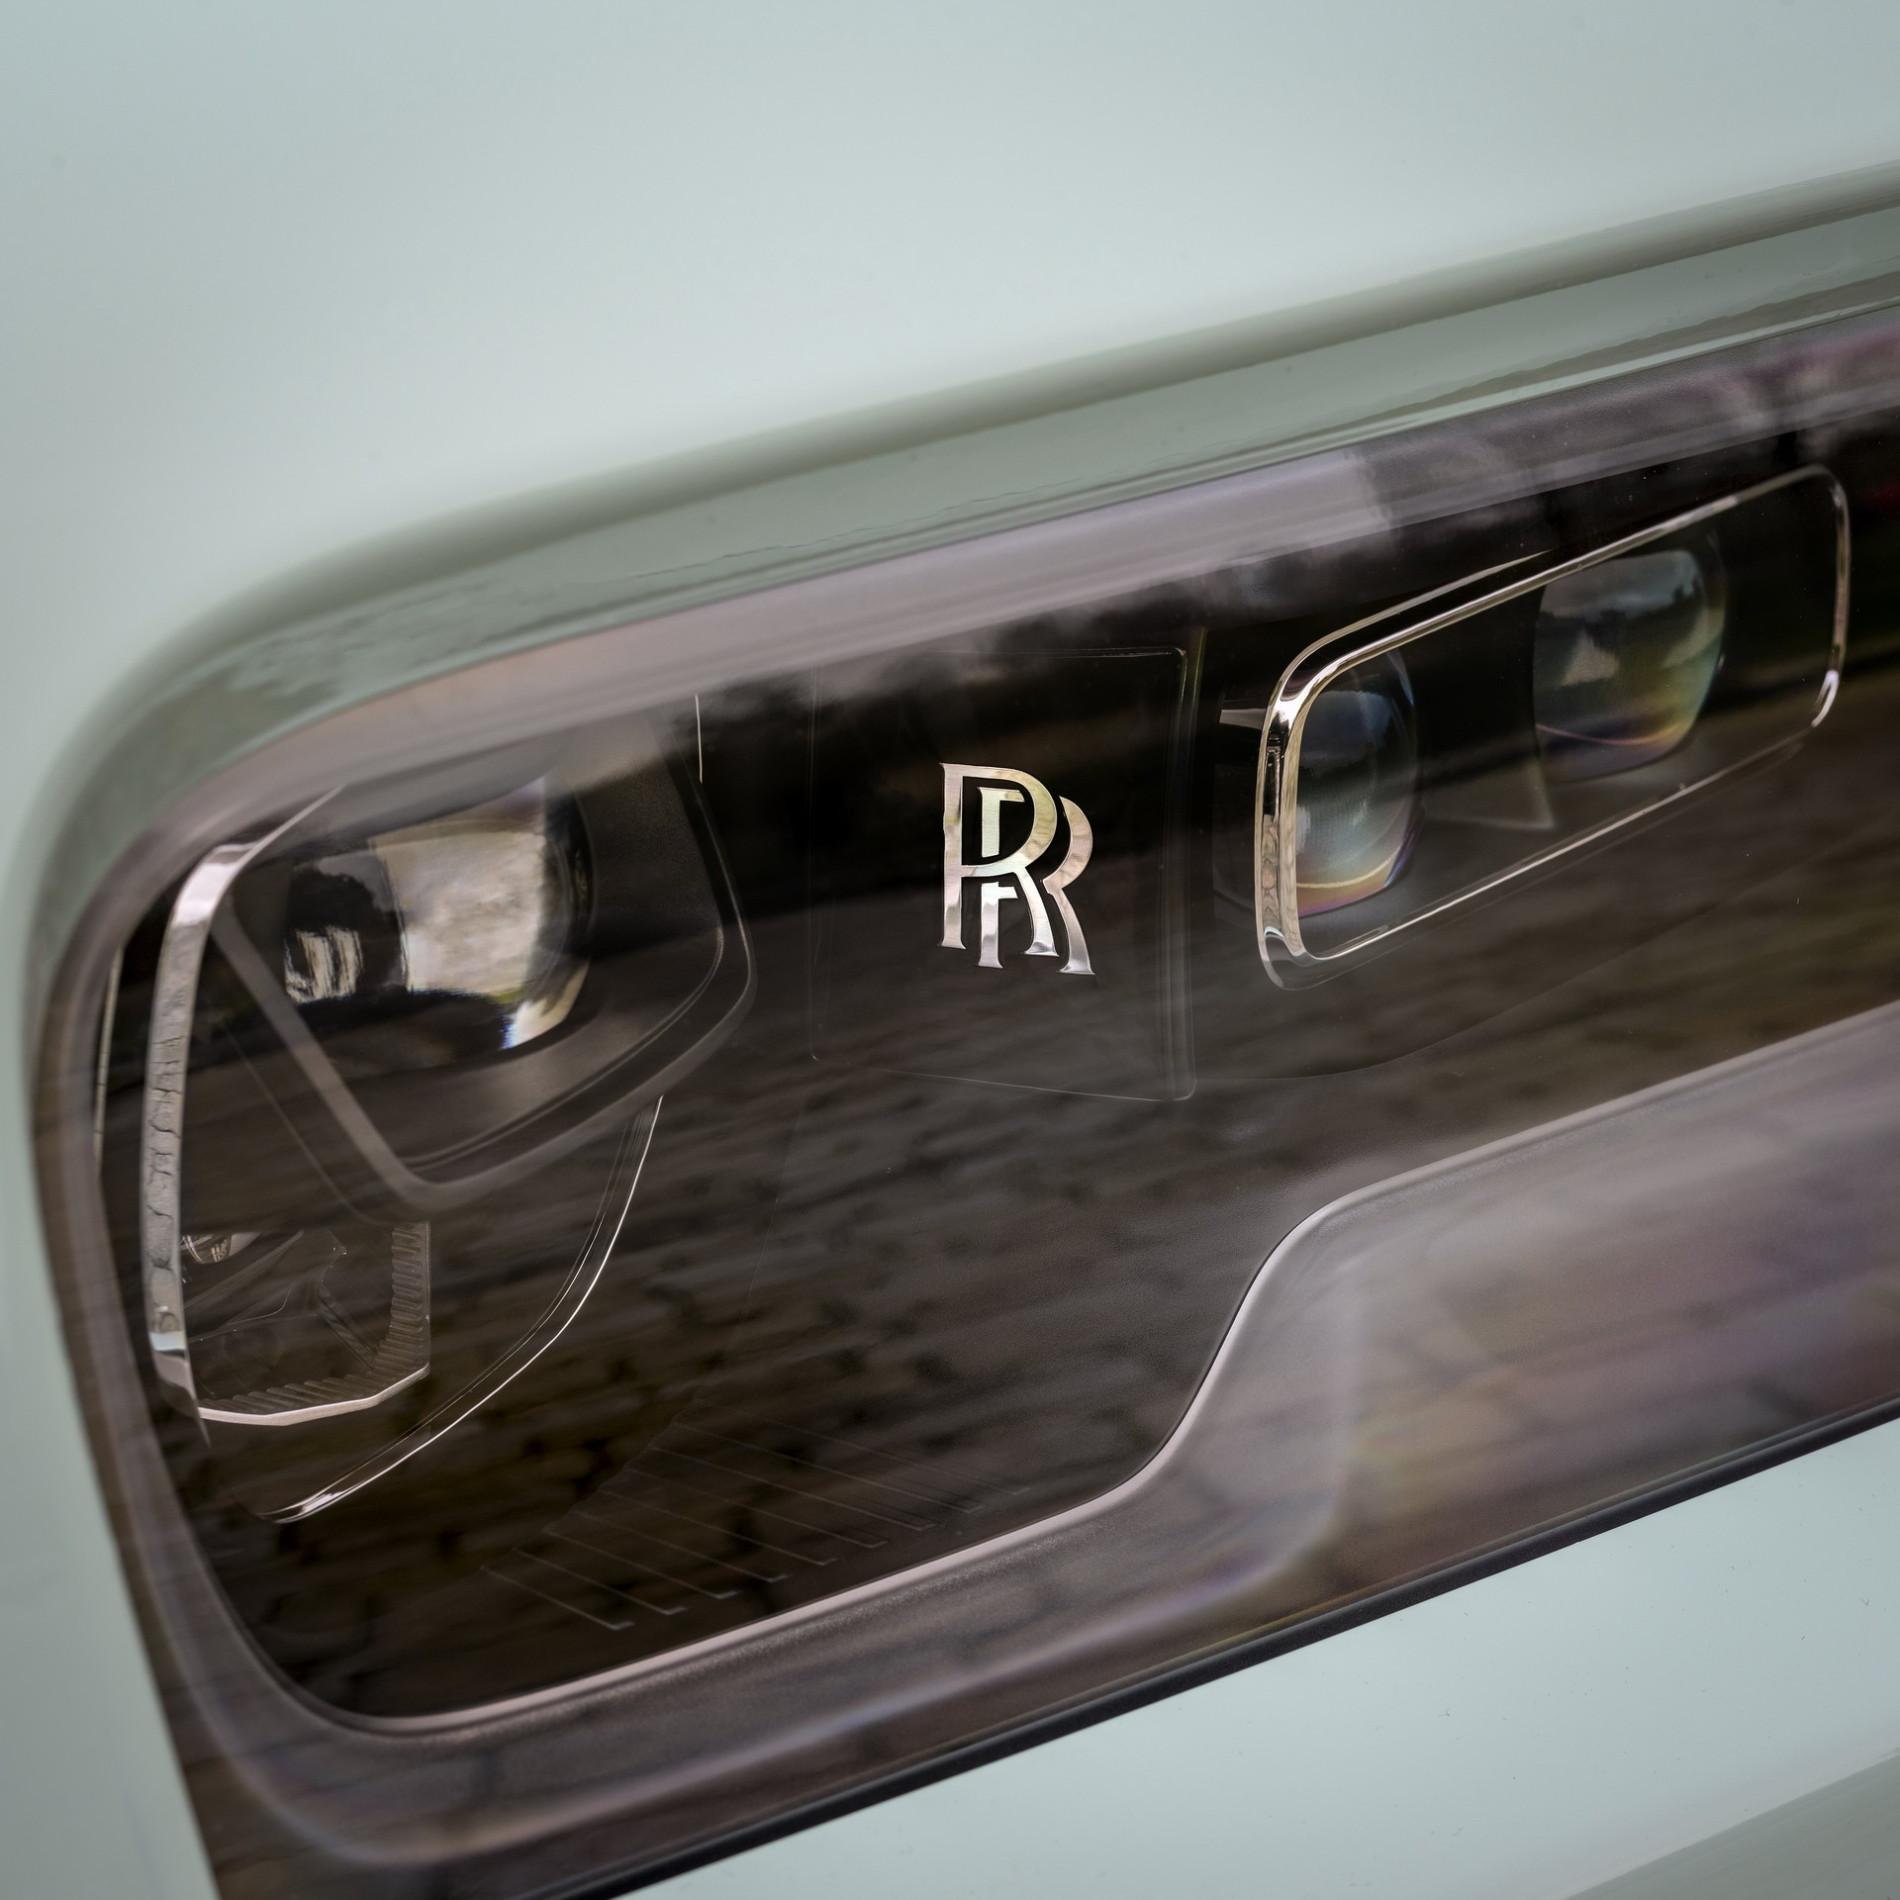 Rolls-Royce la Auto Shanghai 2021 - Rolls-Royce la Auto Shanghai 2021